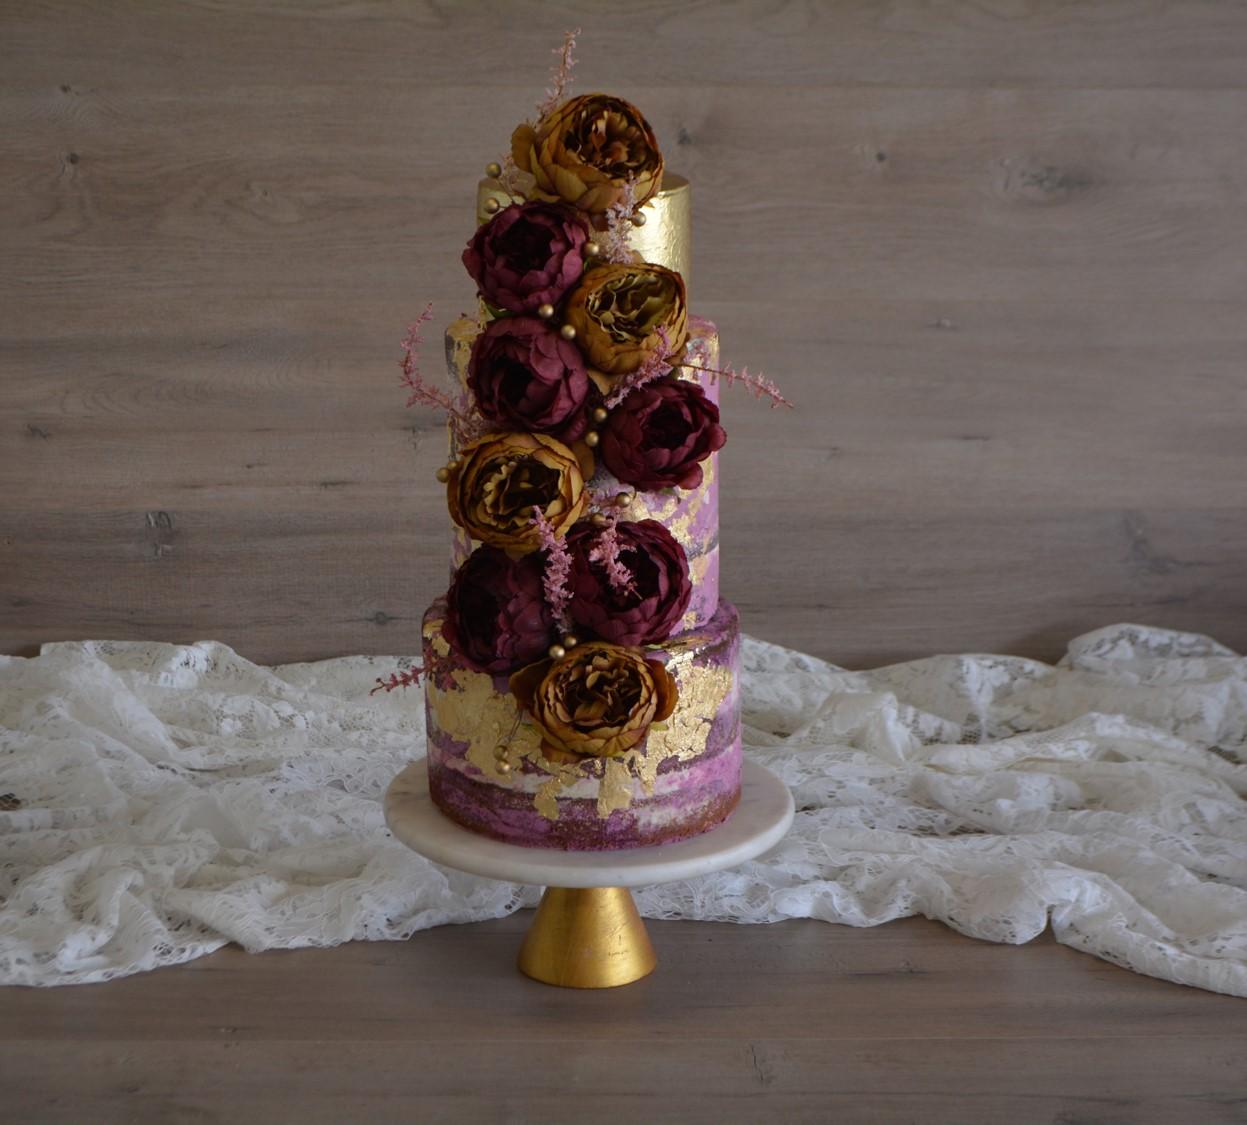 BRISBANE WEDDING CAKES NAKED CAKES ARTISTIC DESIGNER